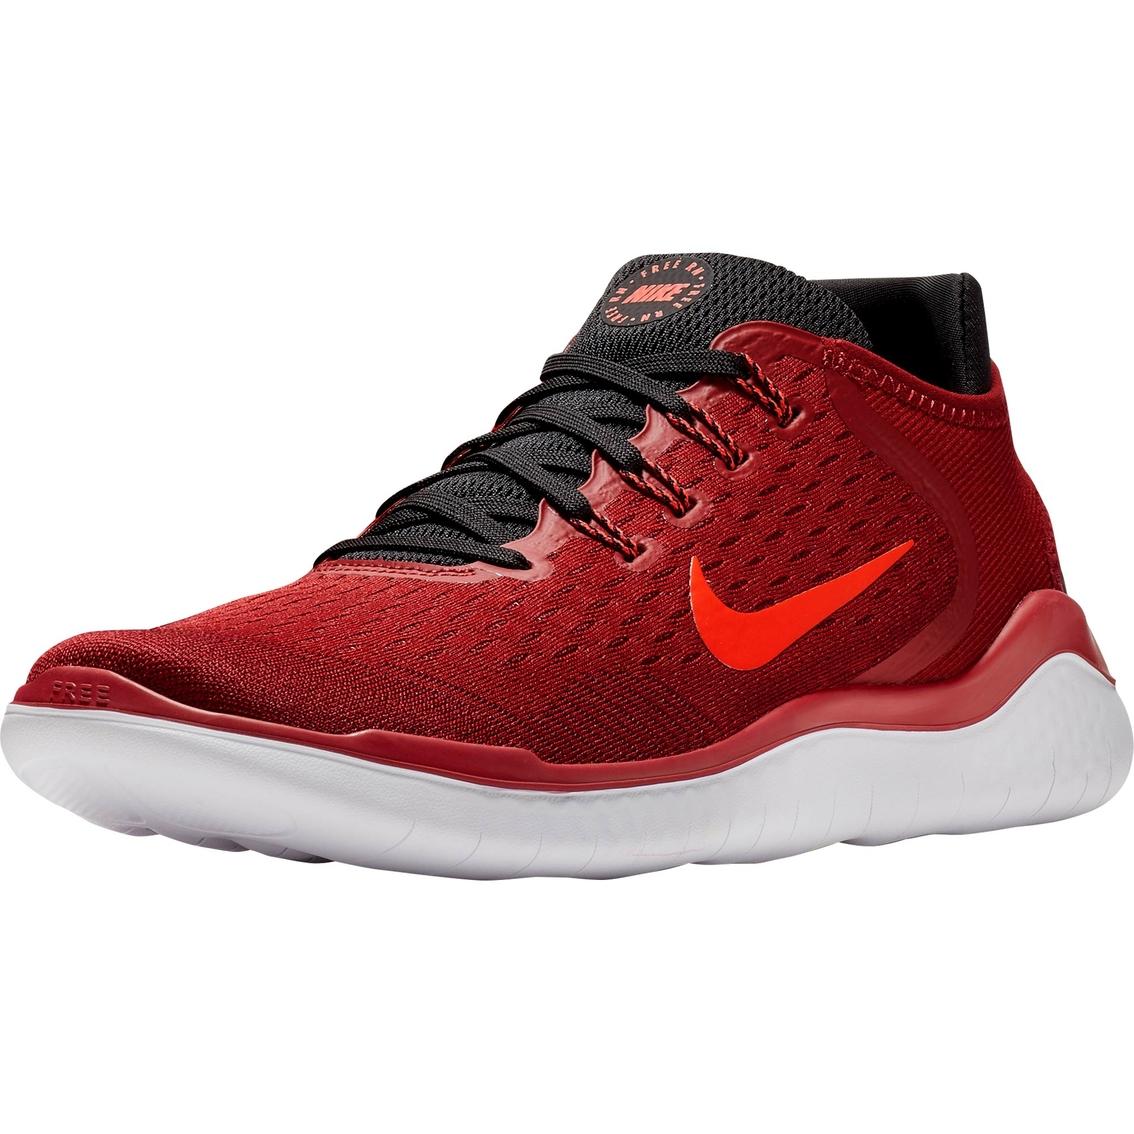 info for 84f50 42dd7 Nike Men s Free RN Flyknit 2018 Running Shoes